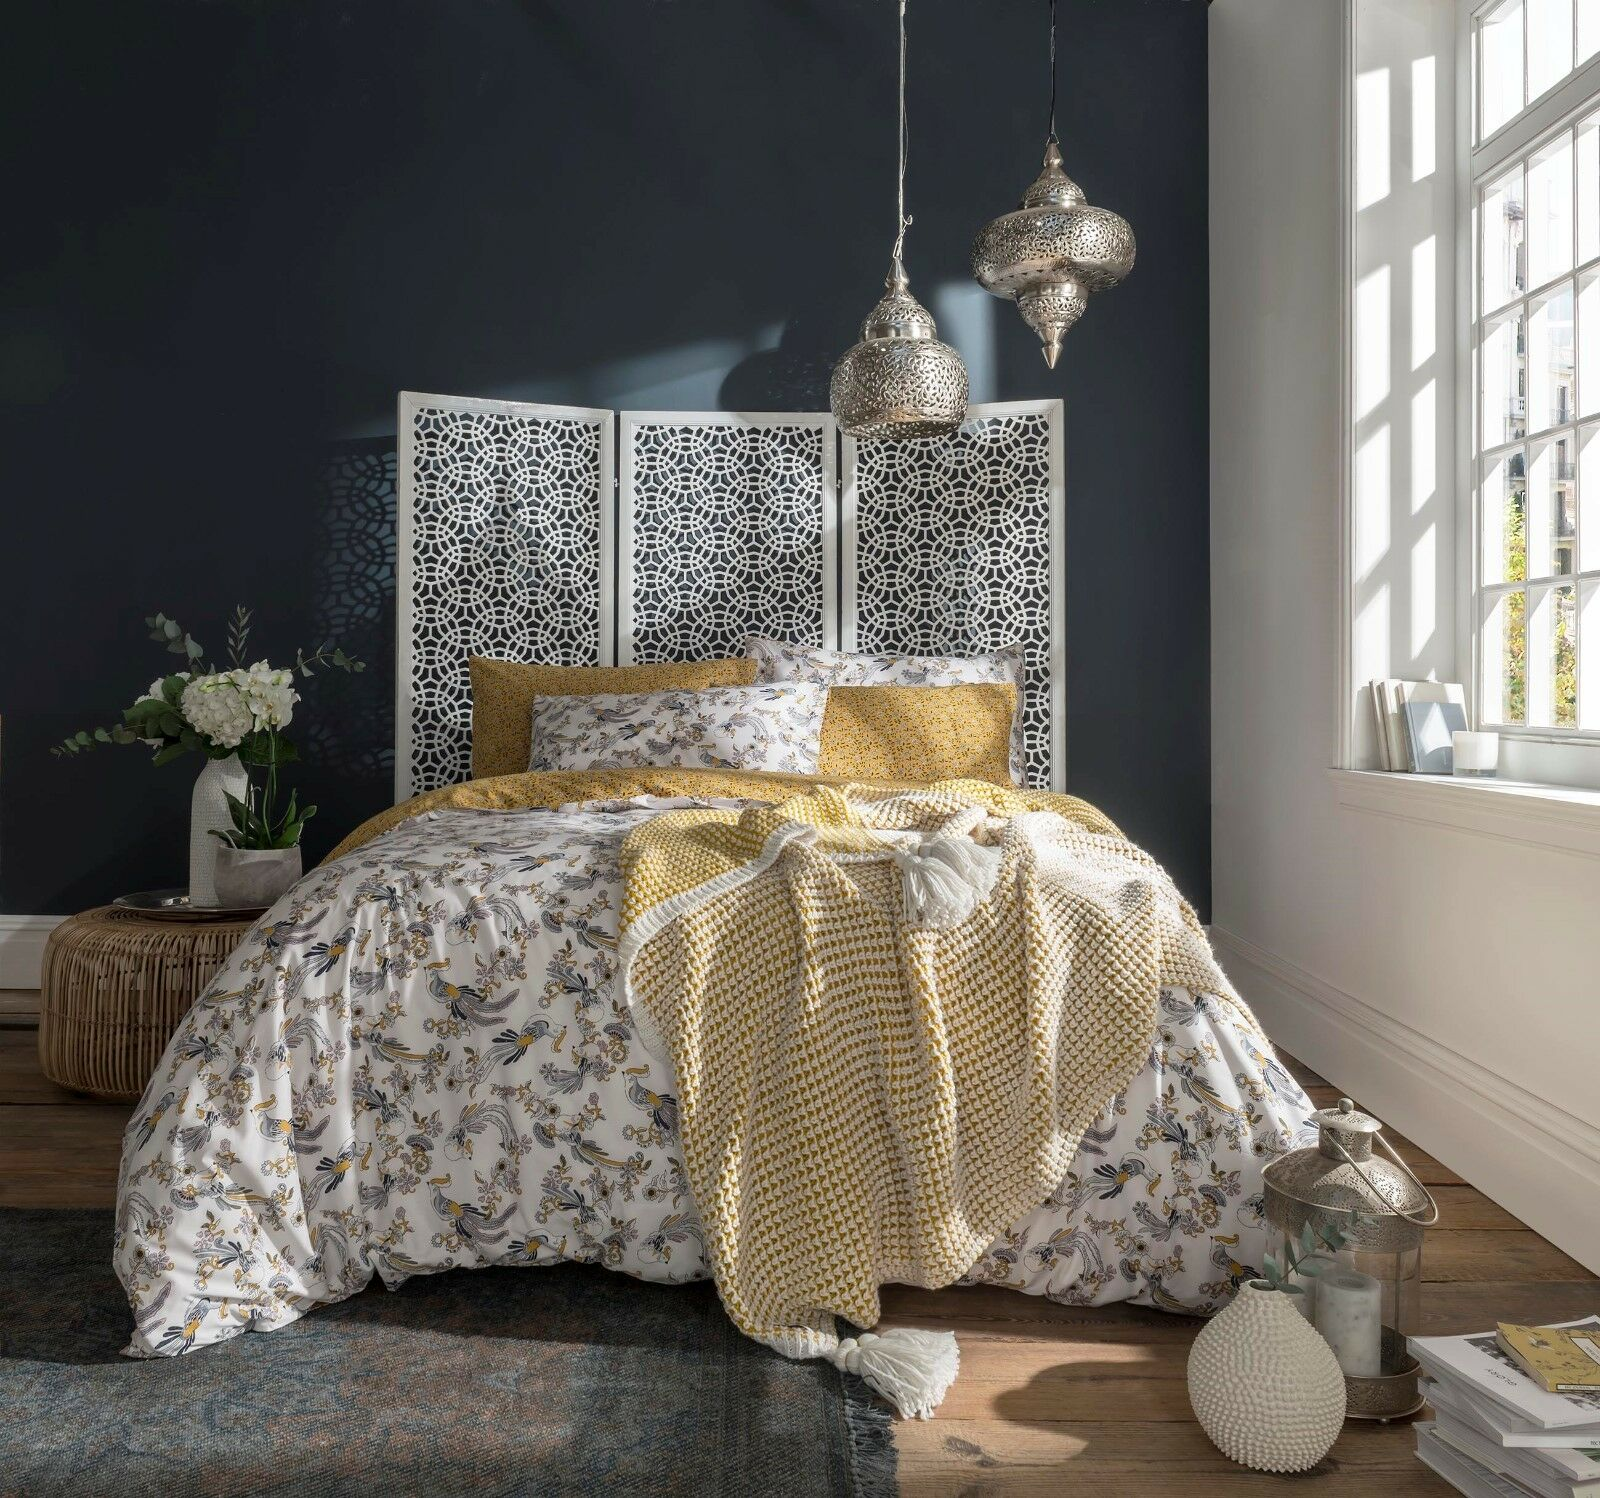 Fat Face Bedding - Oriental Bird 100% Cotton Ochre Duvet Cover Set or Throw